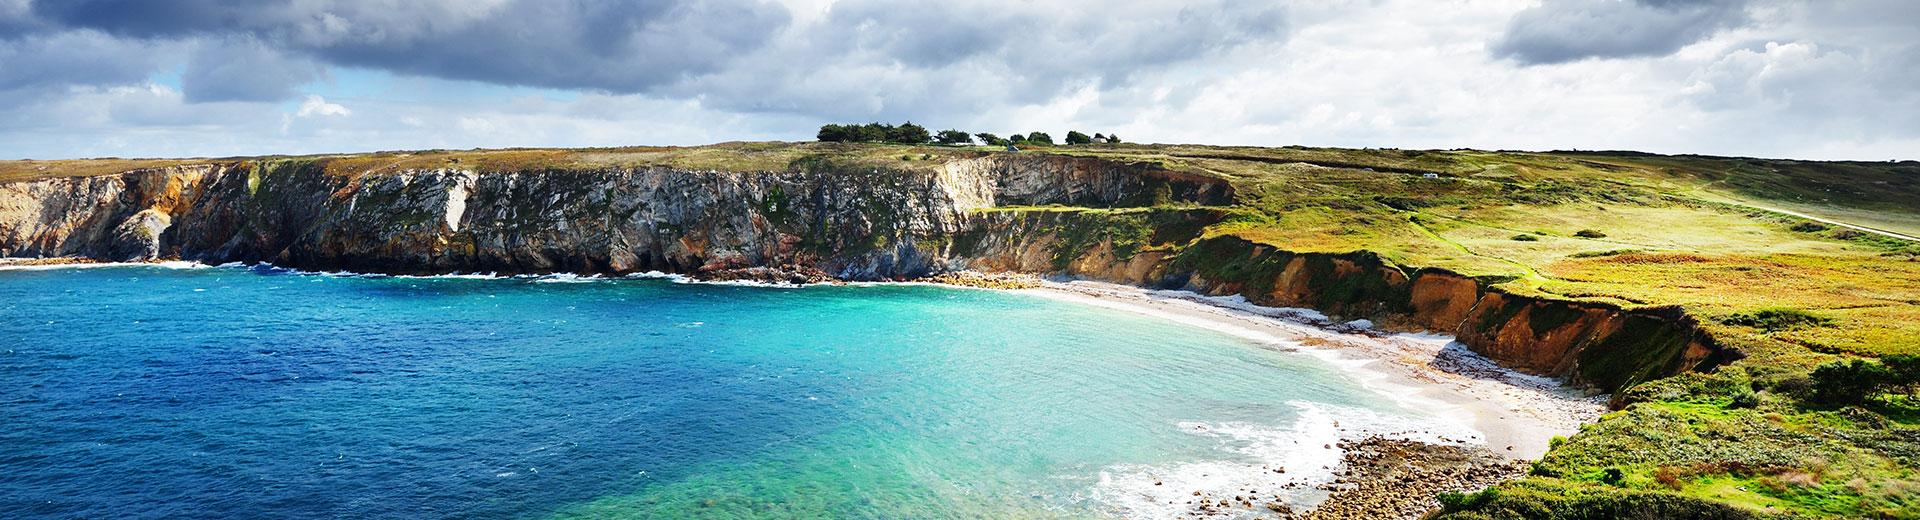 Bretagne – Rundreise mit dem Auto